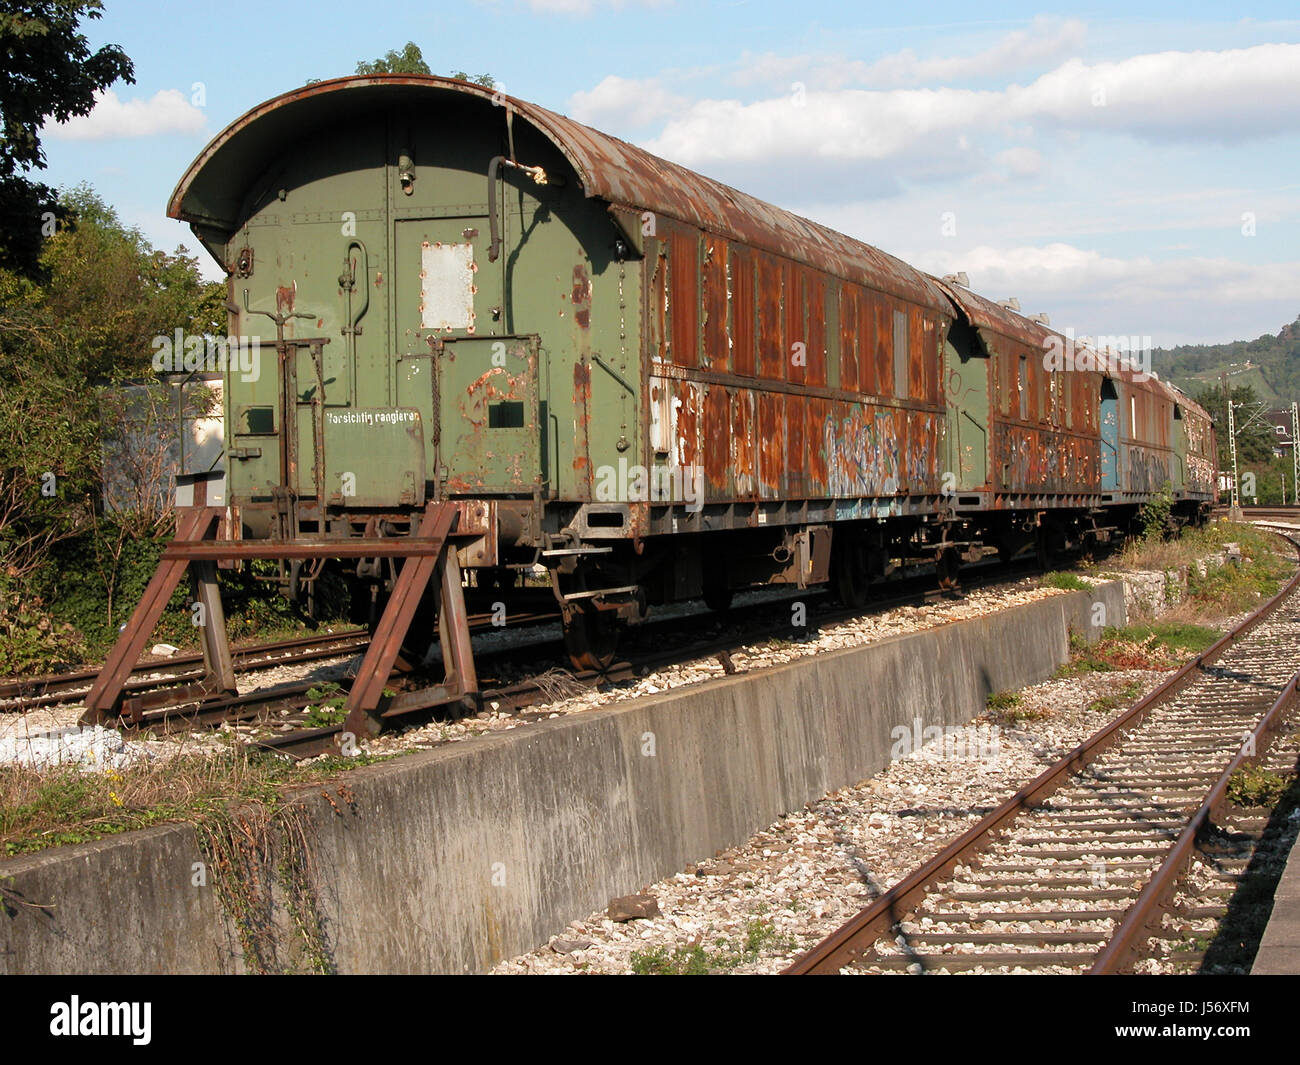 final destination - Stock Image